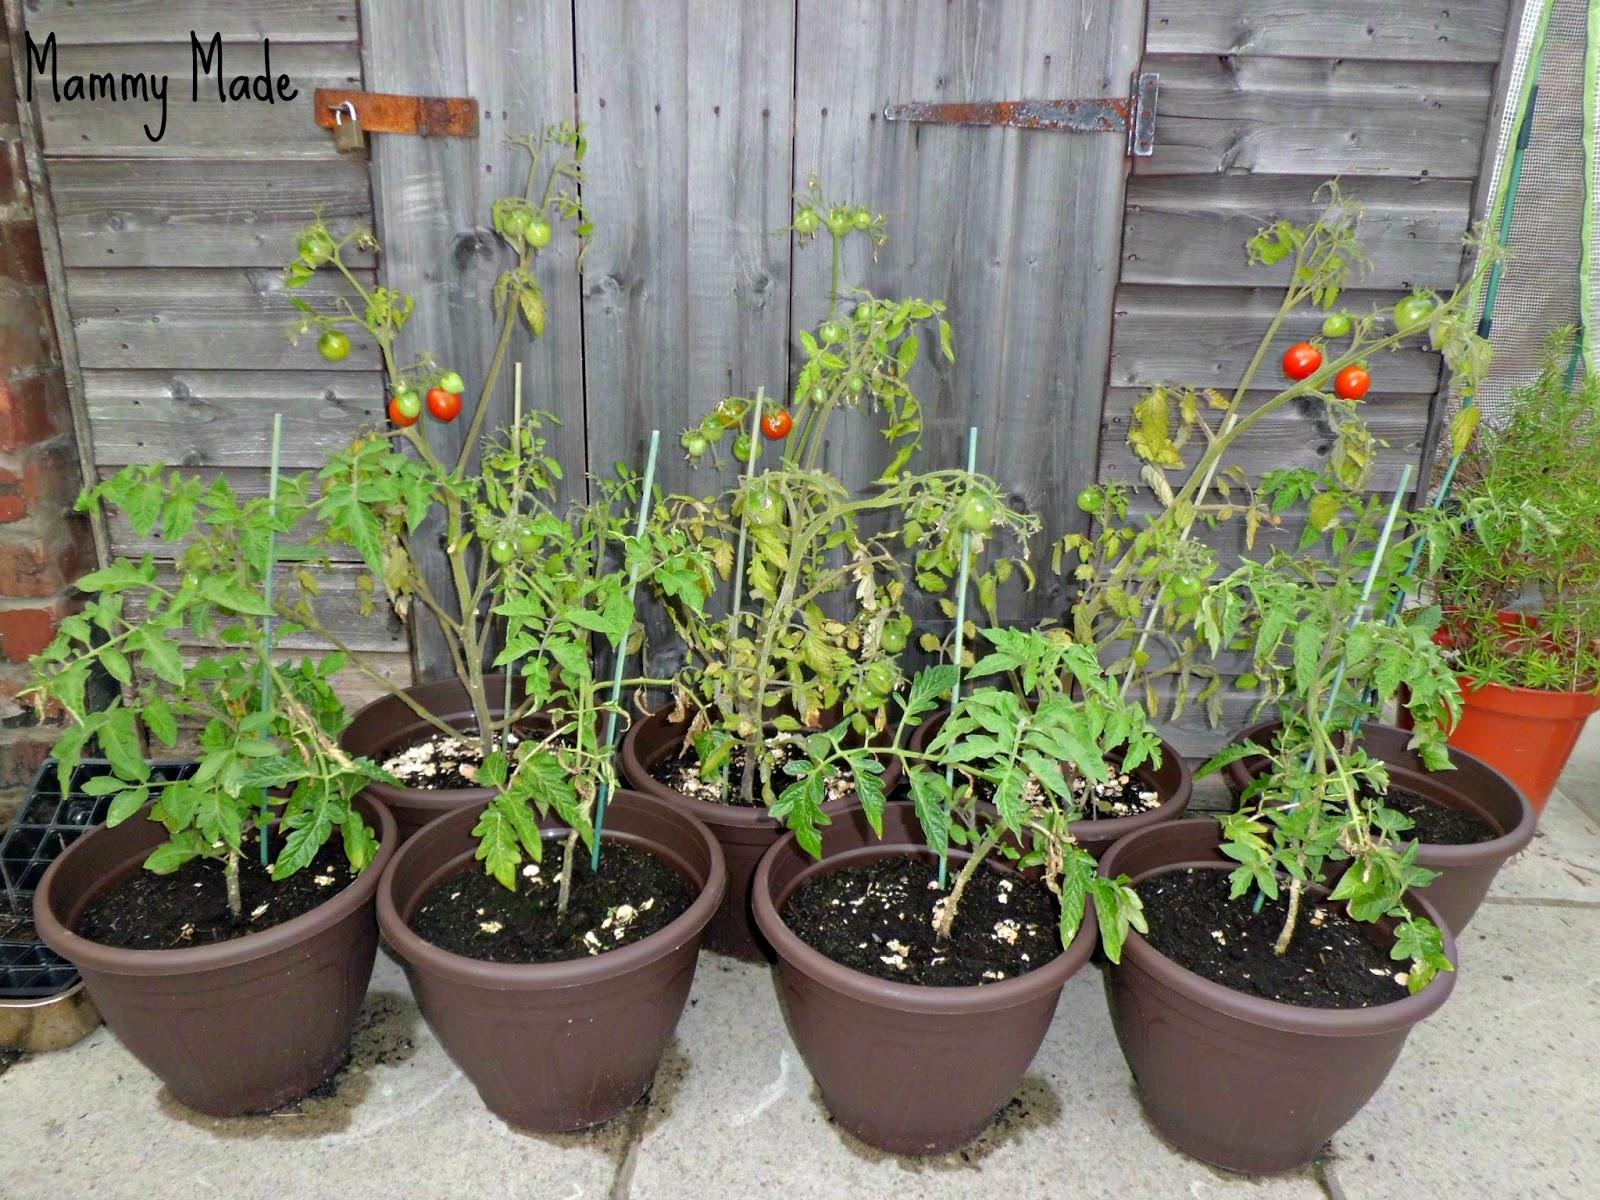 Mammy Made: My Homegrown Vegetable Patio Garden - Week 16